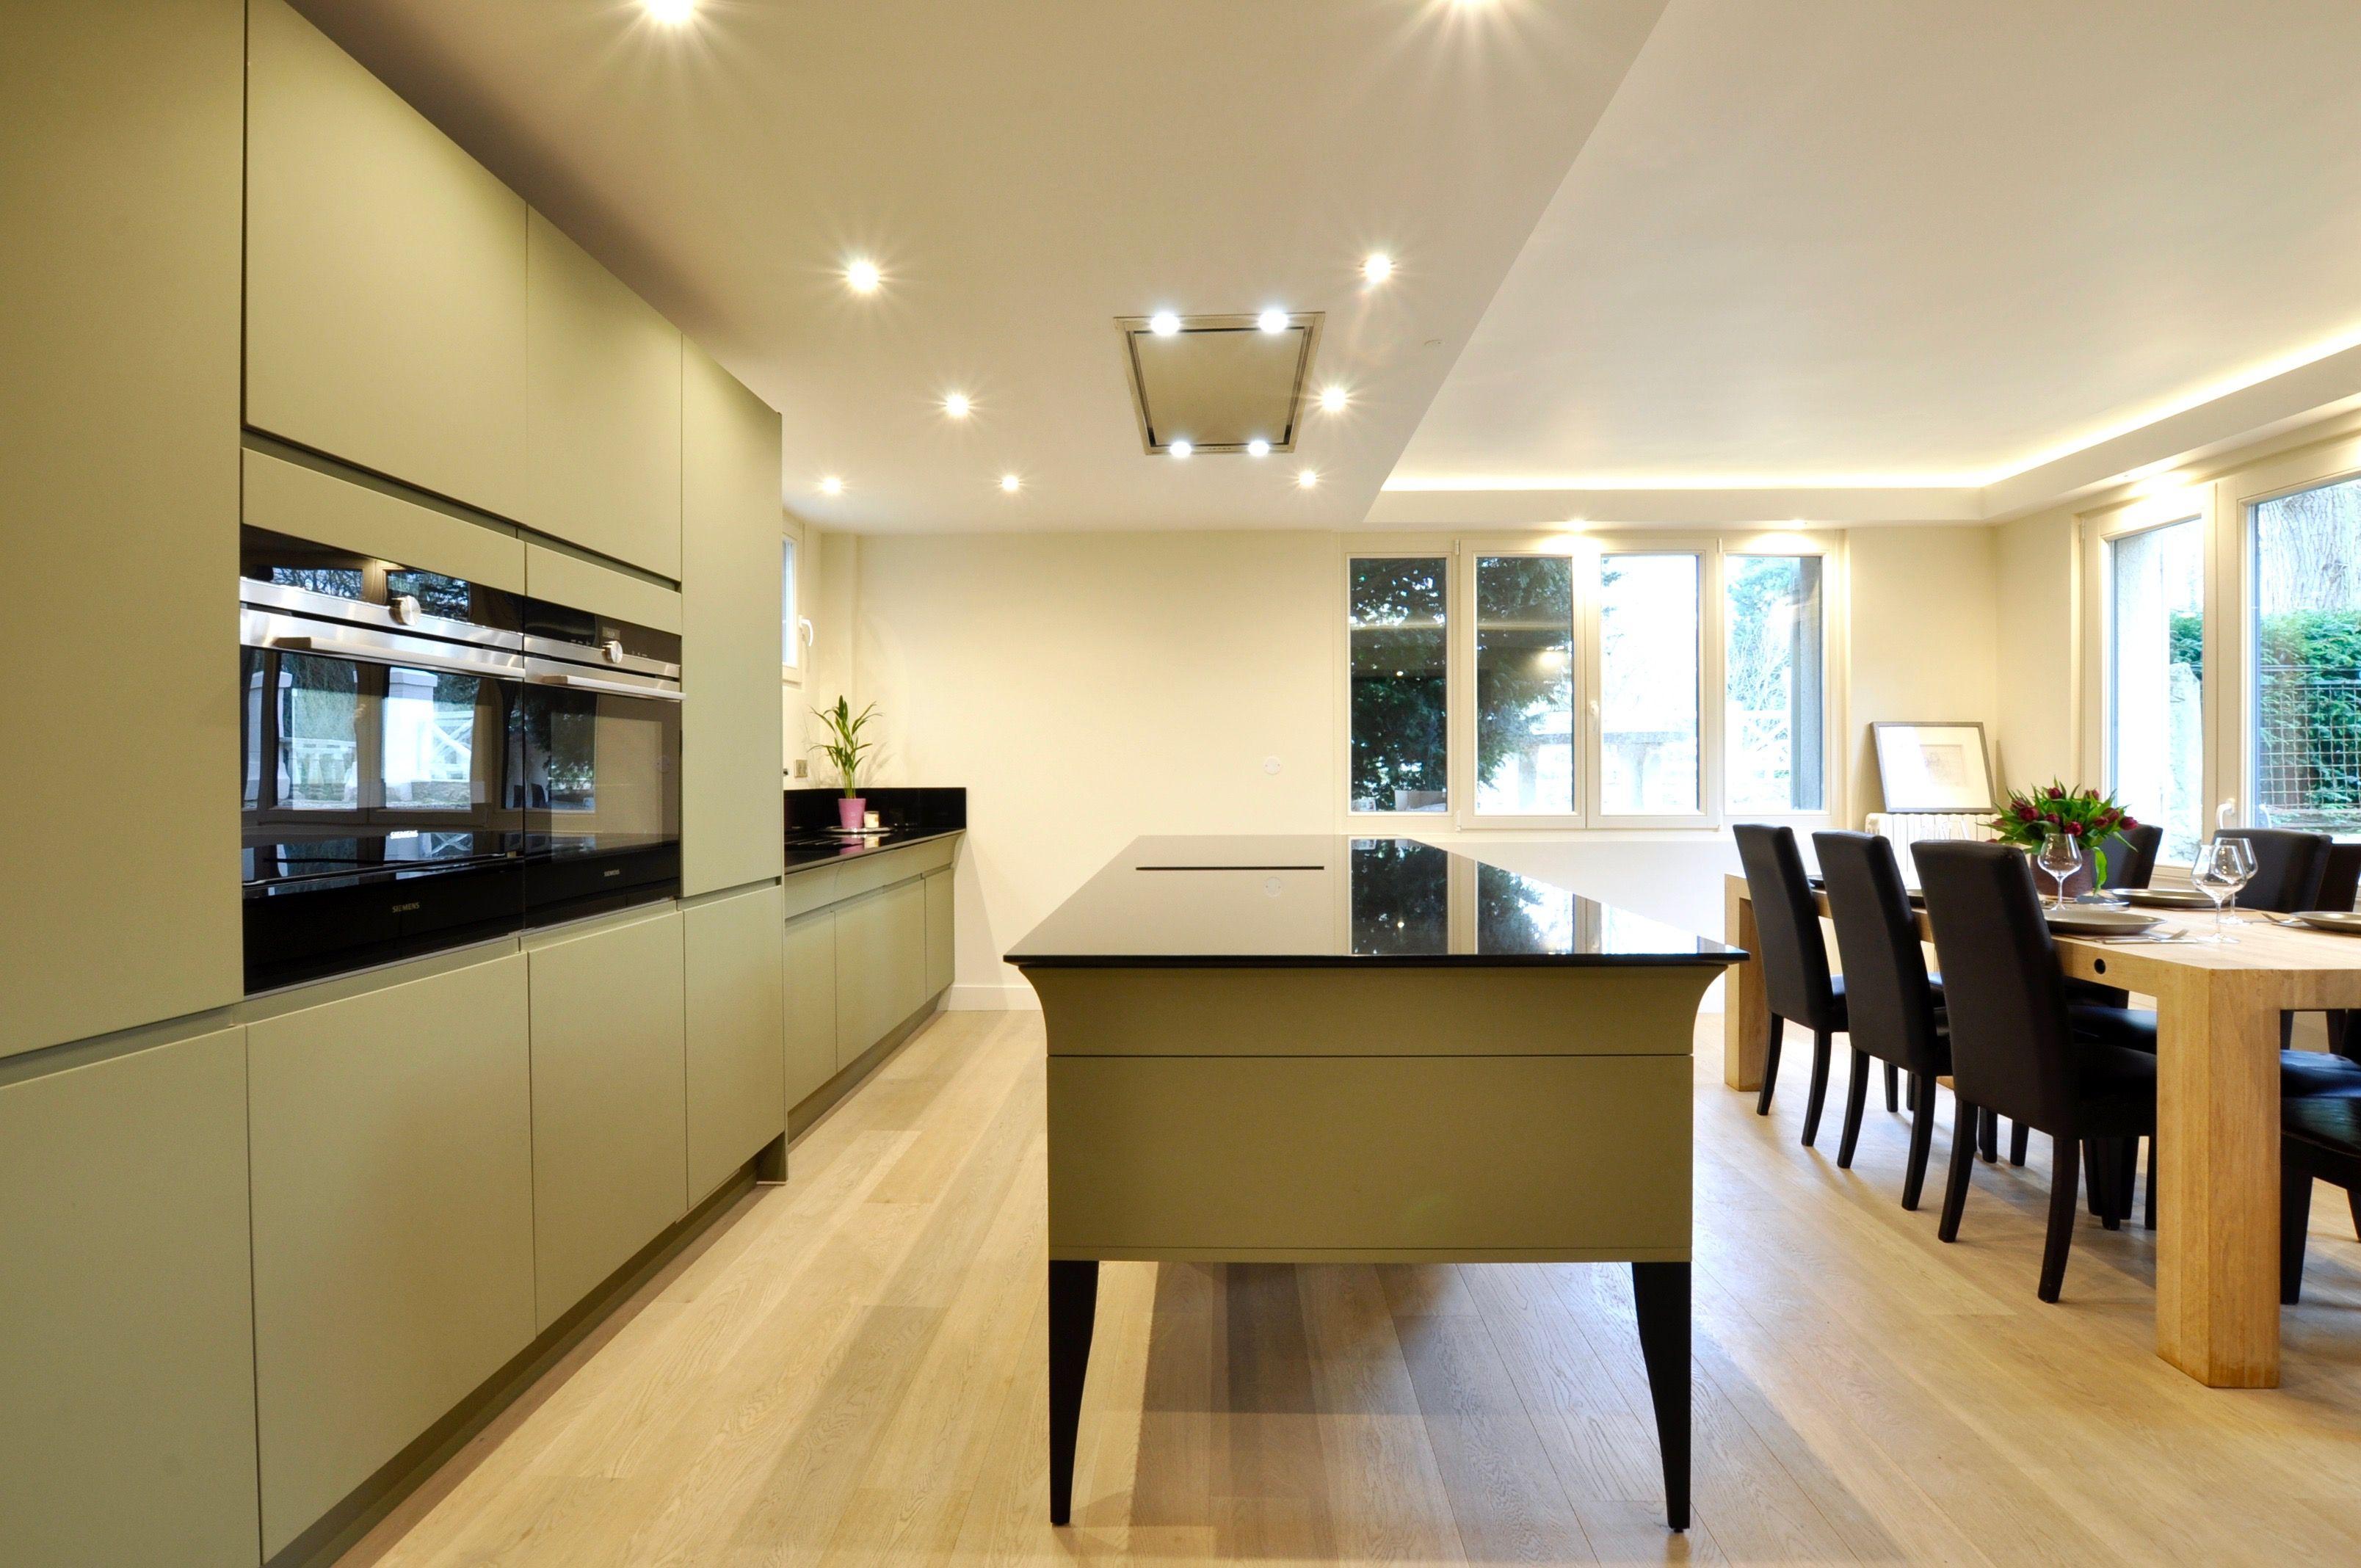 Cuisine Ikea Bois Et Inox ~ Cuisine Design Avec Lot Central Mod Le Alice Ilot Central